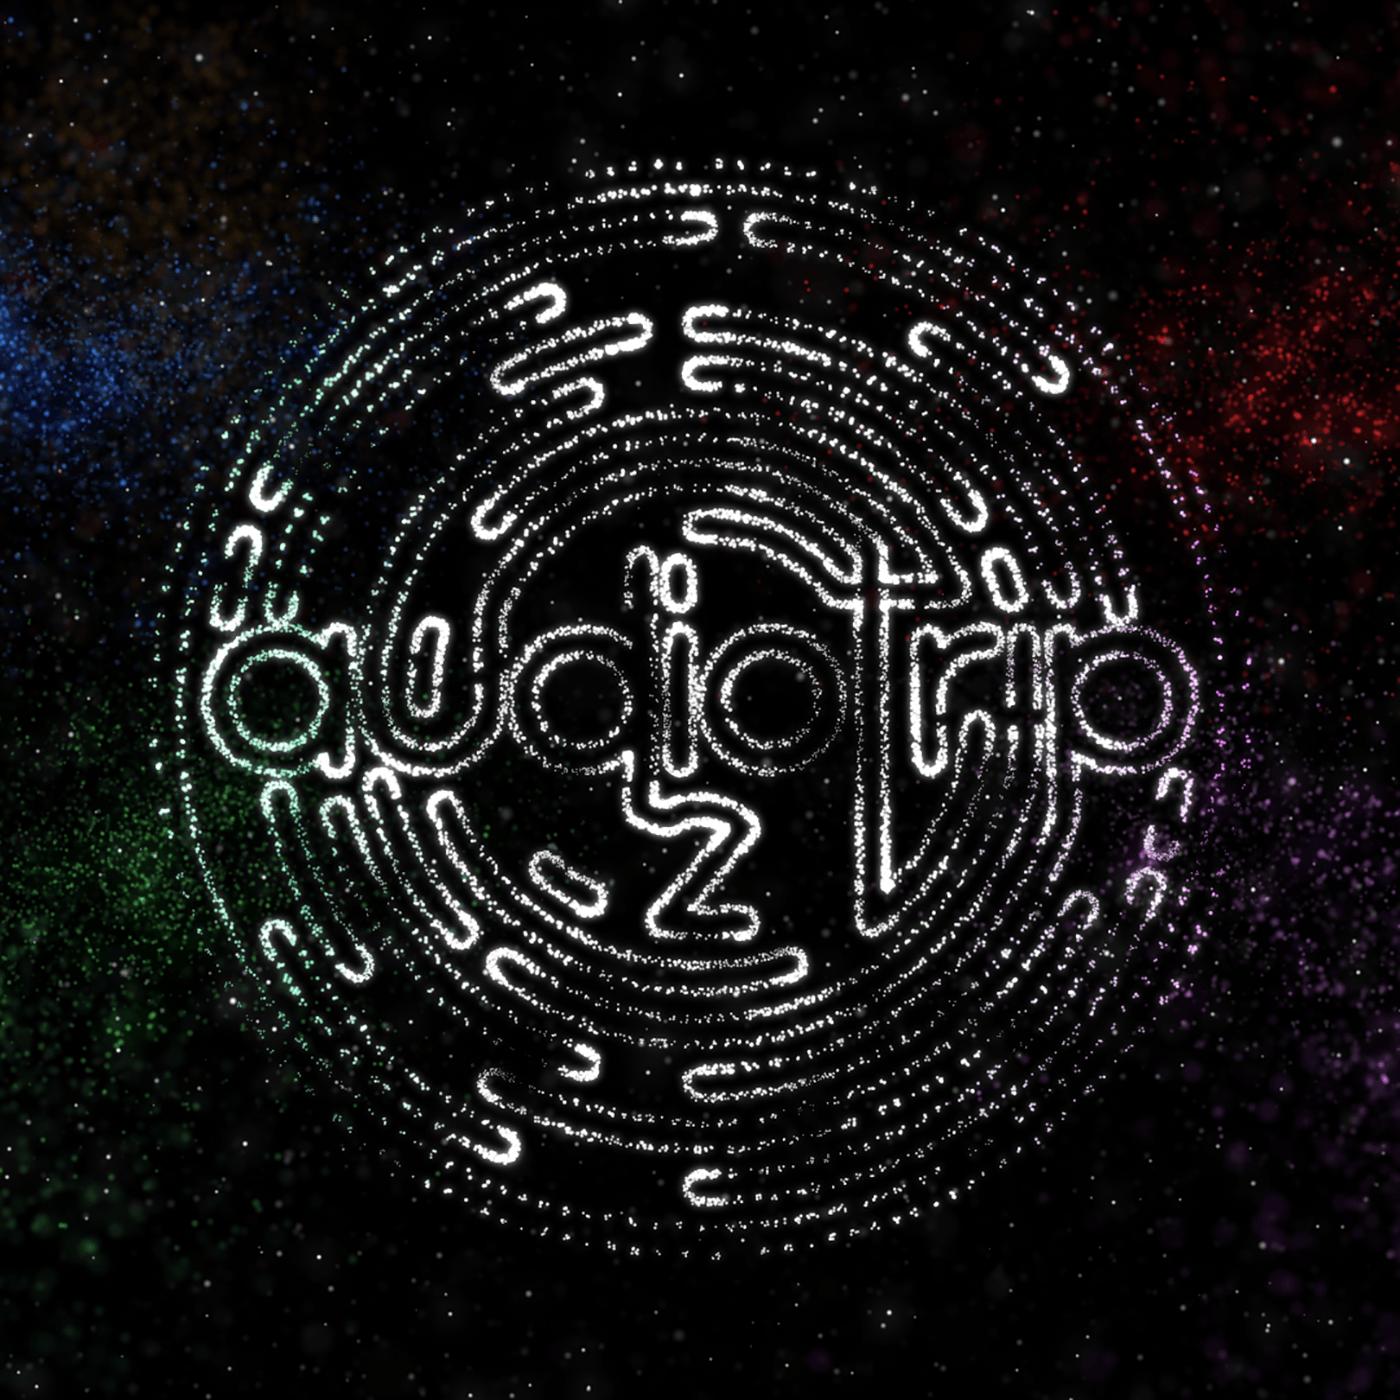 AudioTrip 2 by Nino Bless